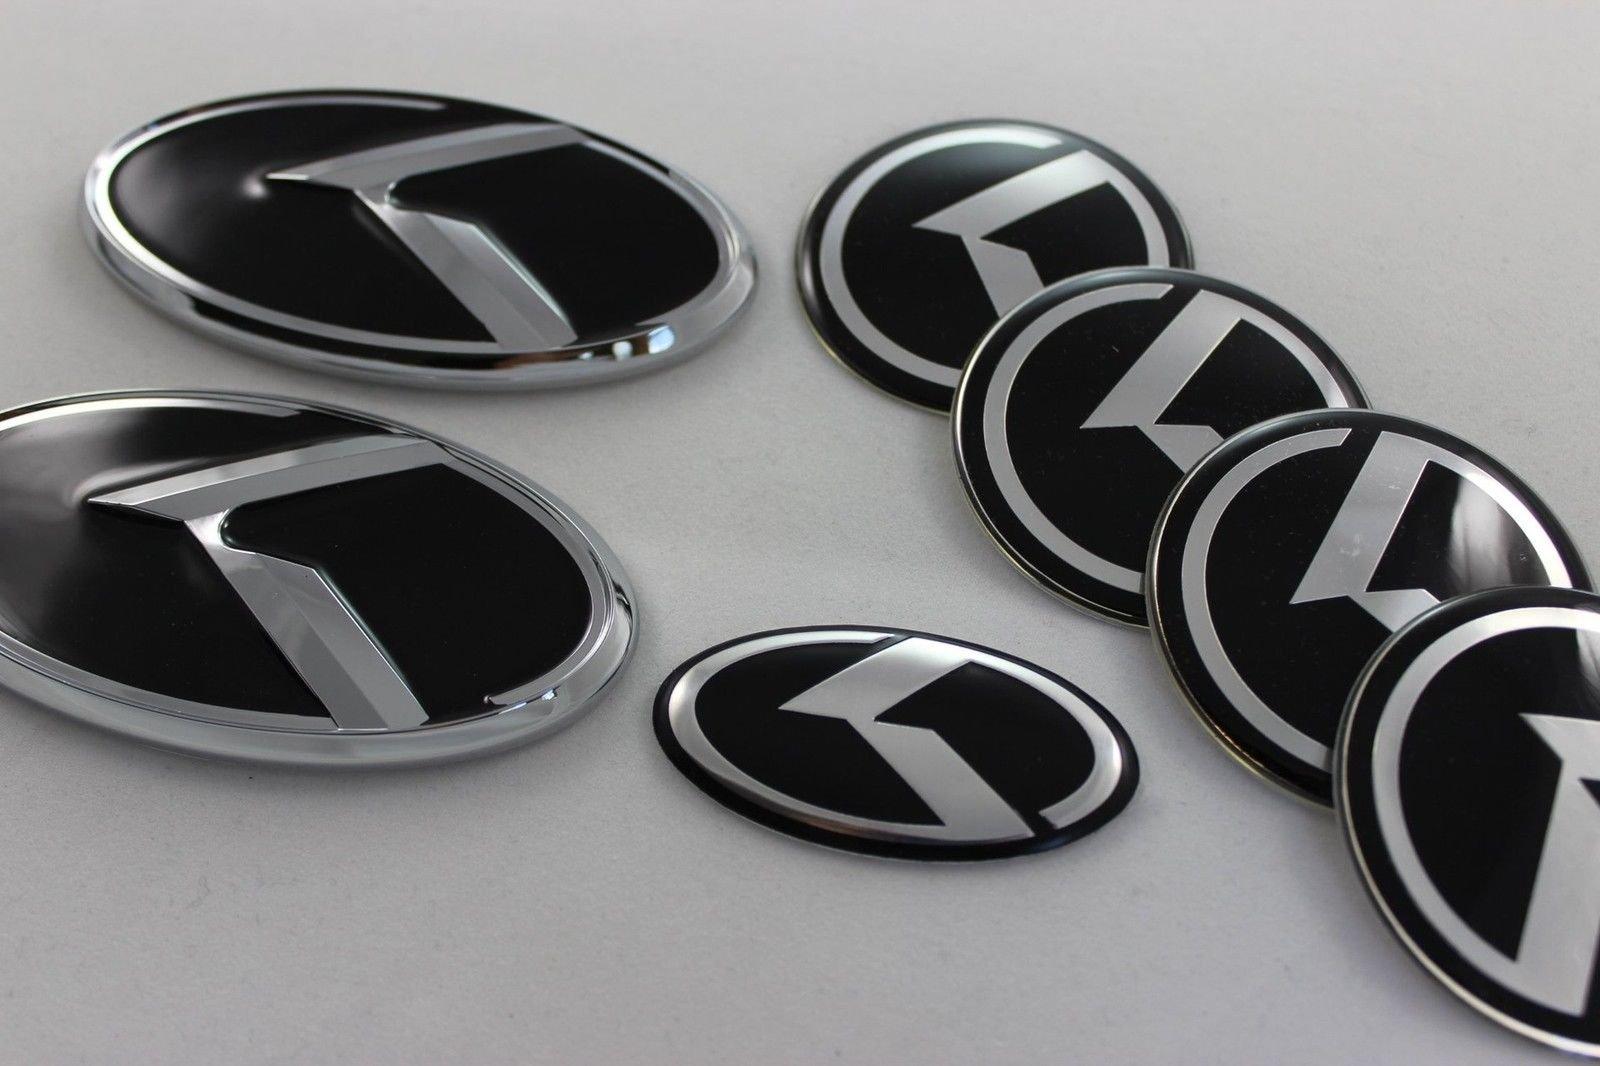 Exotic Store KA-S7B 7 Pieces 2011-2015 Fit for KIA OPTIMA K5 3D Carbon Fiber Chrome Black WING Logo Front+ Trunk+ Steering wheel+ Rim center Caps Stickers TURBO Kit Emblem Badges (Black)